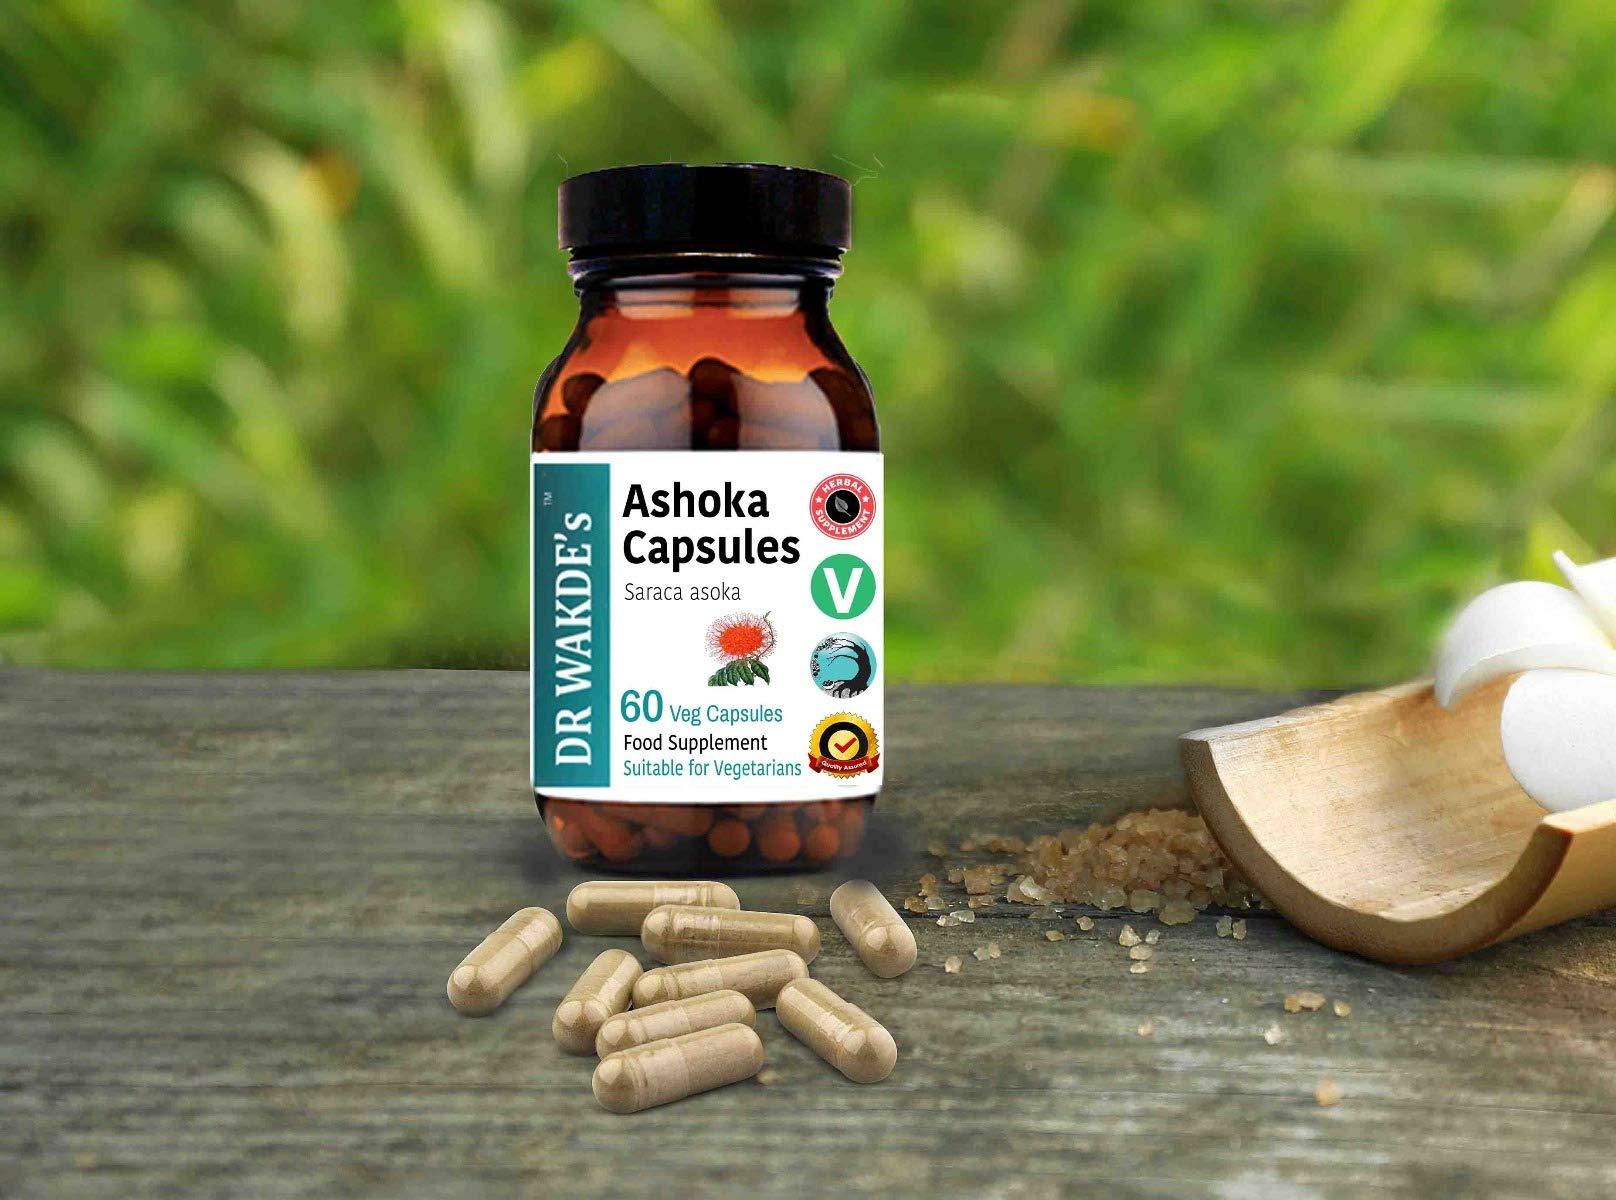 DR WAKDE'S® Ashoka Capsules (Saraca asoka) I 100% Herbal I 60 Veggie Capsules I Ayurvedic Supplement I FREE SHIPPING on multiples I Quantity Discounts I Same Day Dispatch